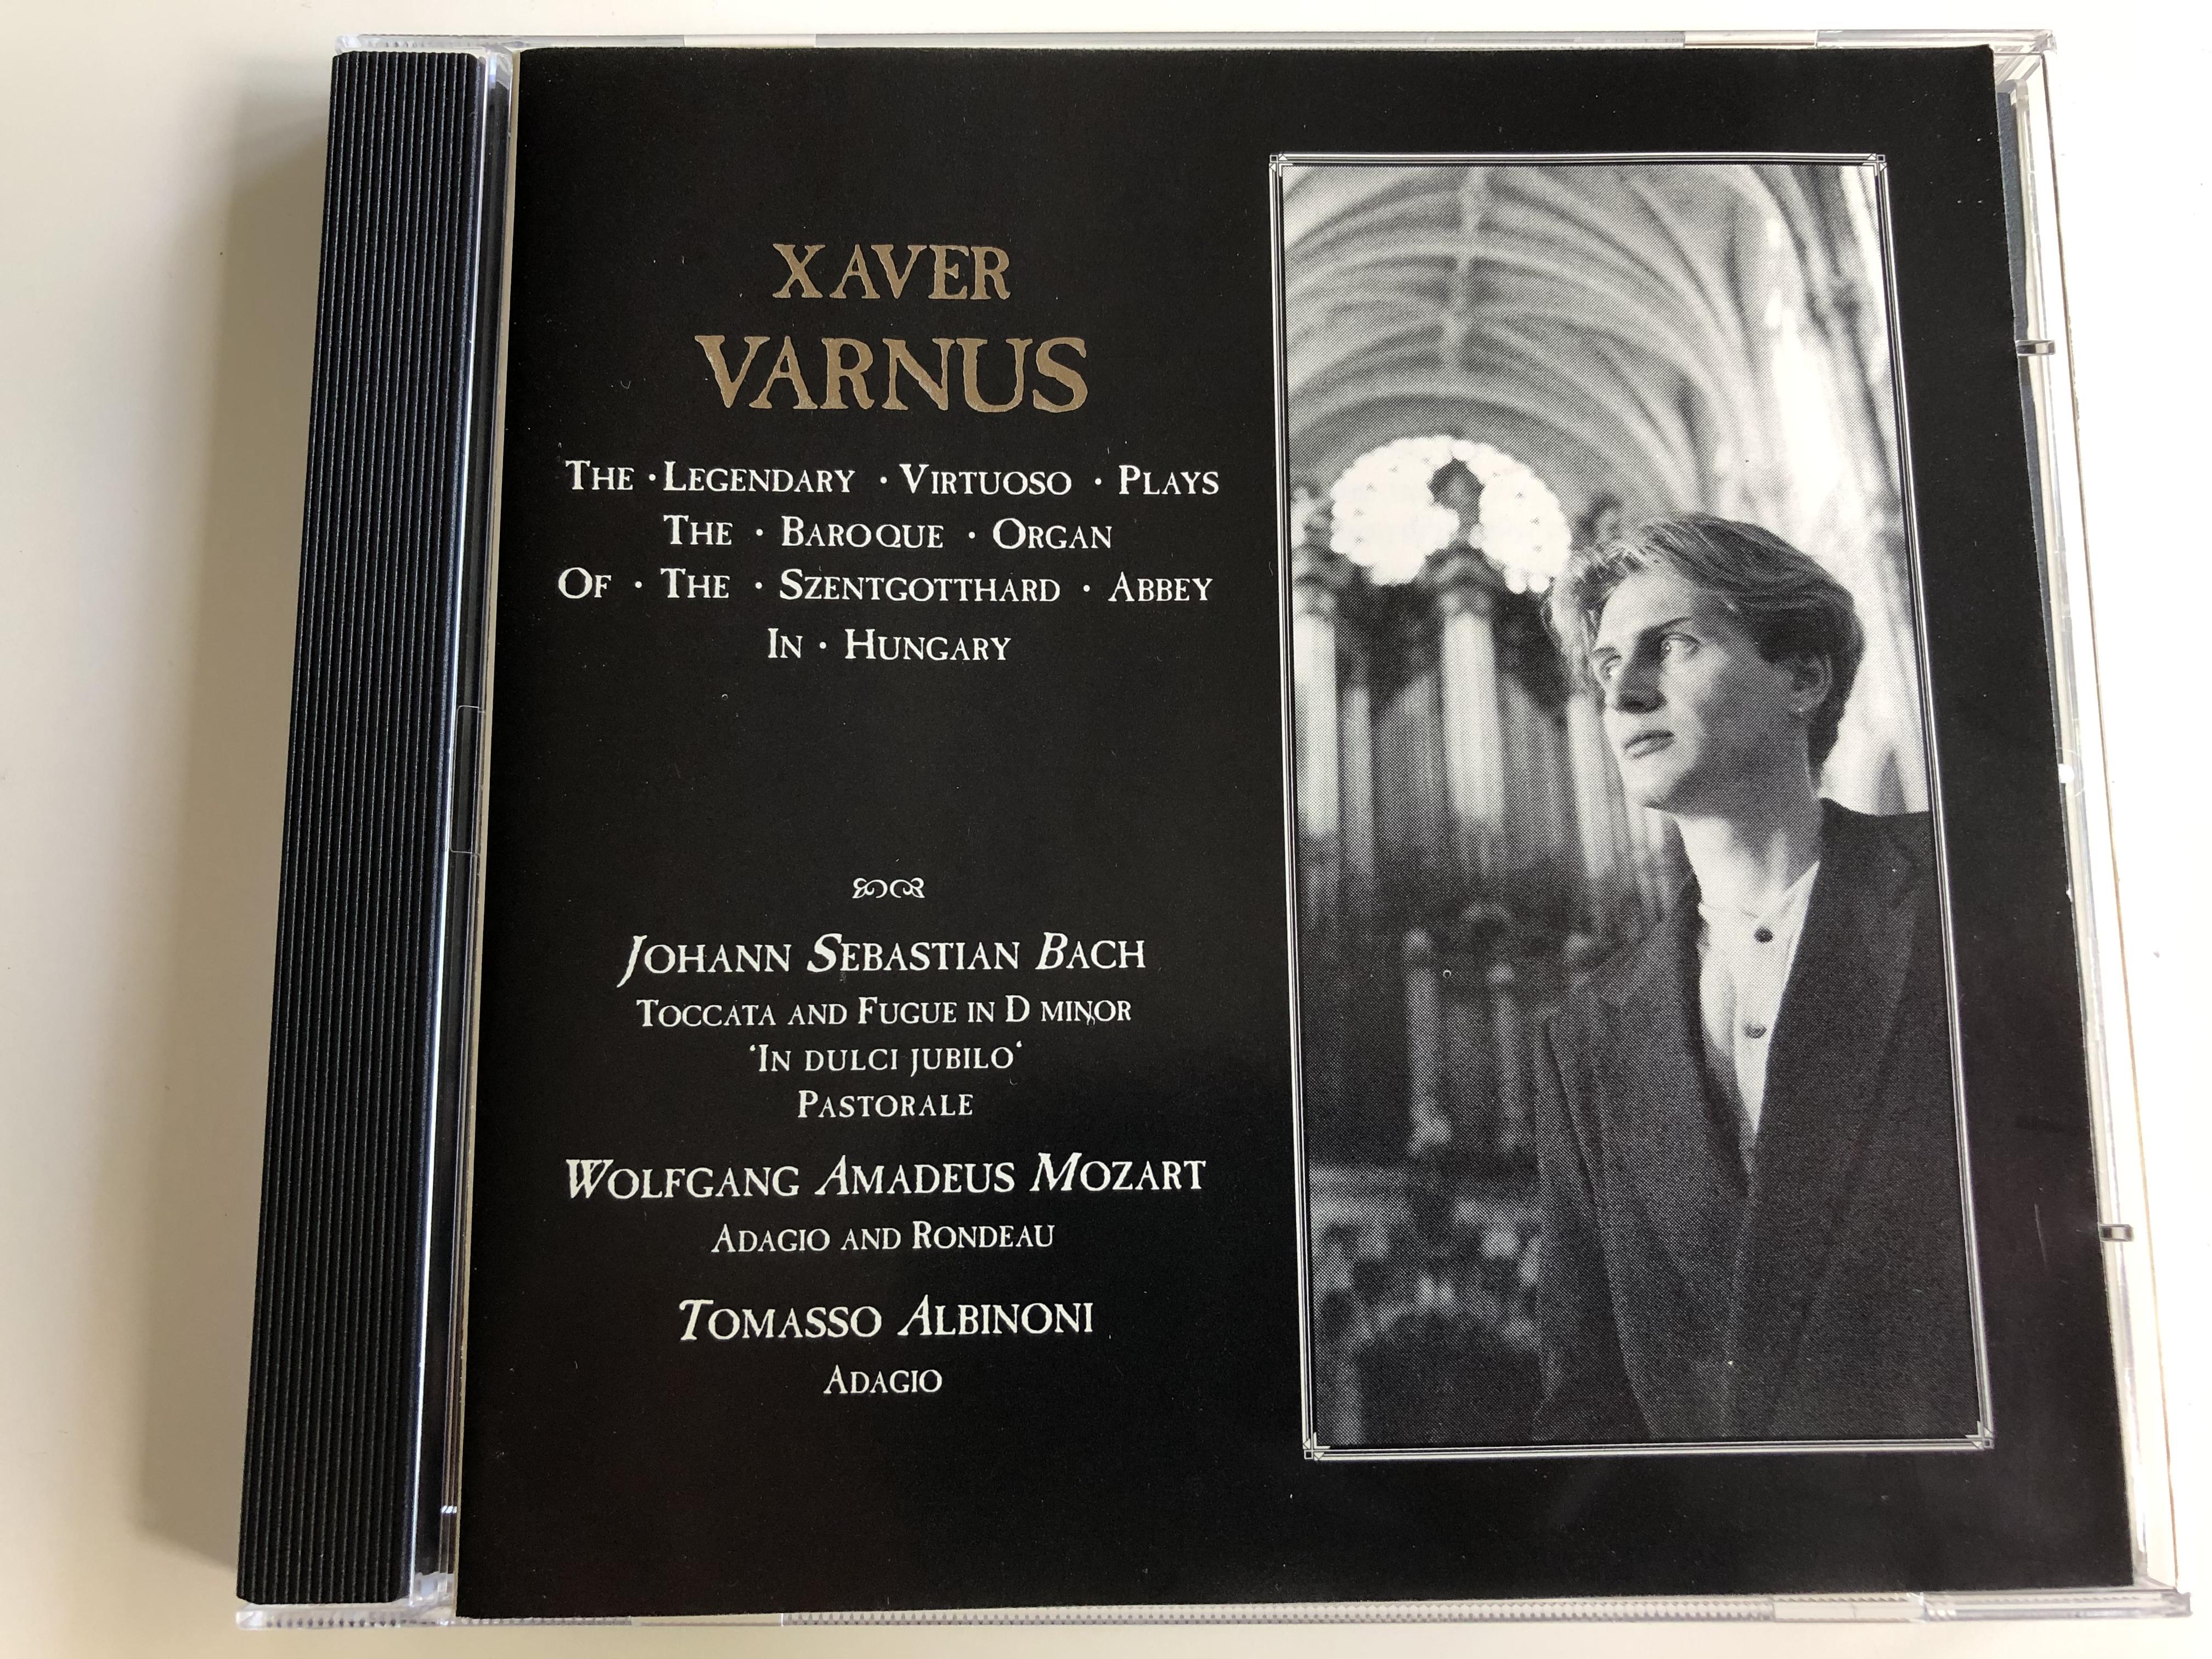 xaver-varnus-the-legendary-virtuoso-plays-the-baroque-organ-of-the-szentgotthard-abbey-in-hungary-bach-mozart-albinoni-audio-cd-1-.jpg